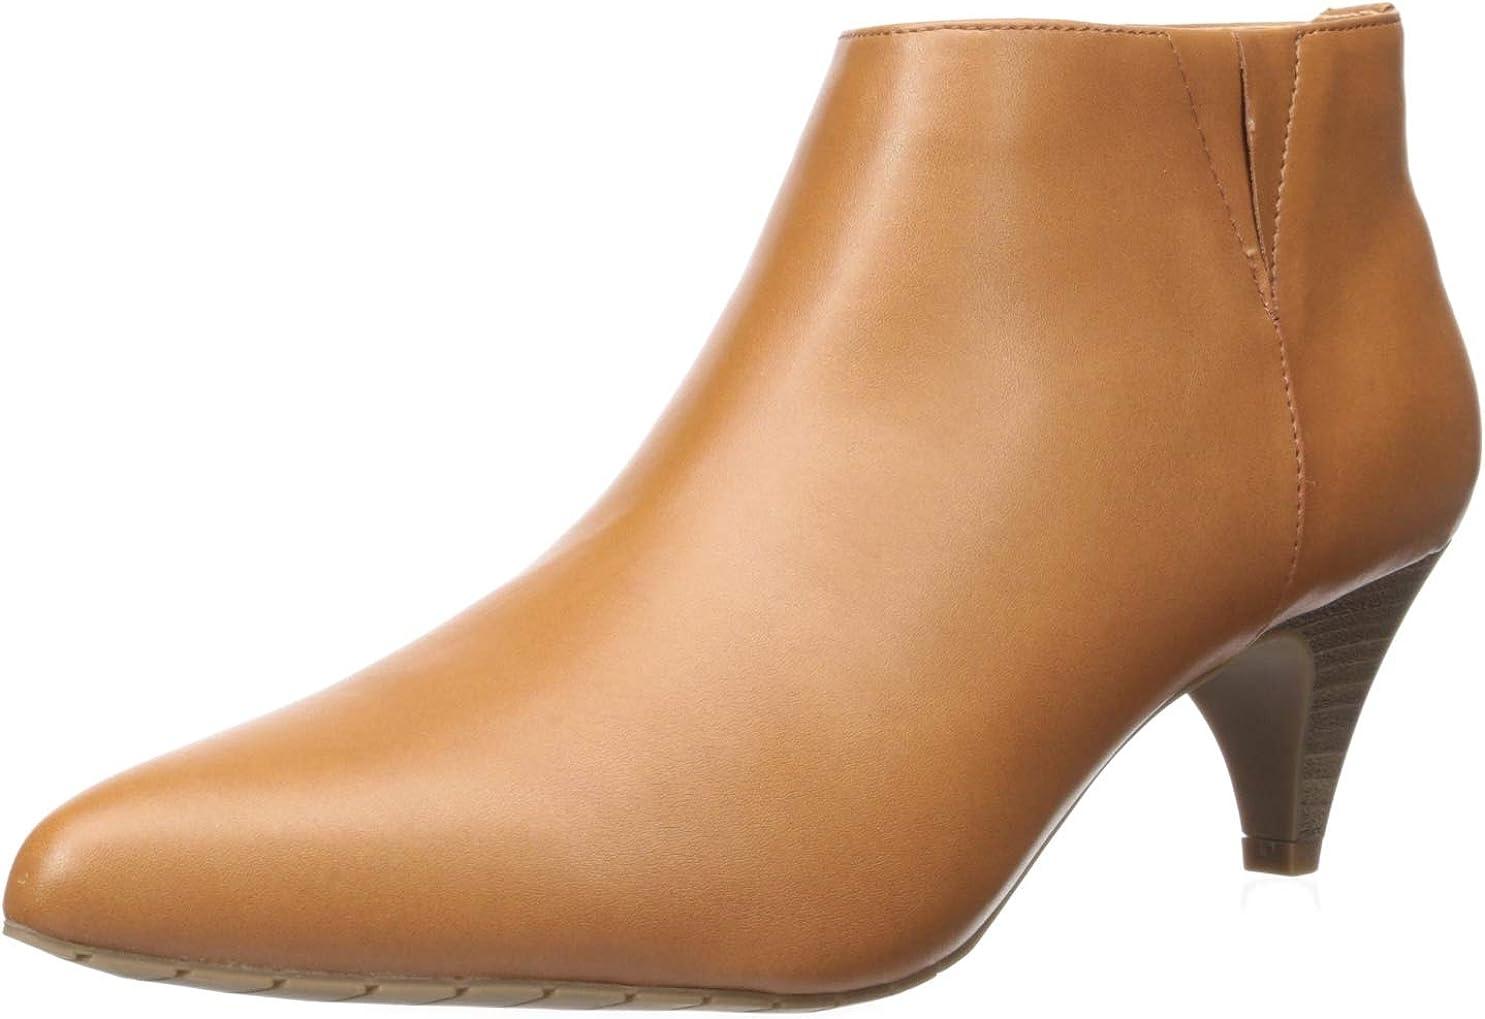 Kenneth Cole New York Women's Boot Kick ショッピング 送料無料 一部地域を除く Shootie Ankle